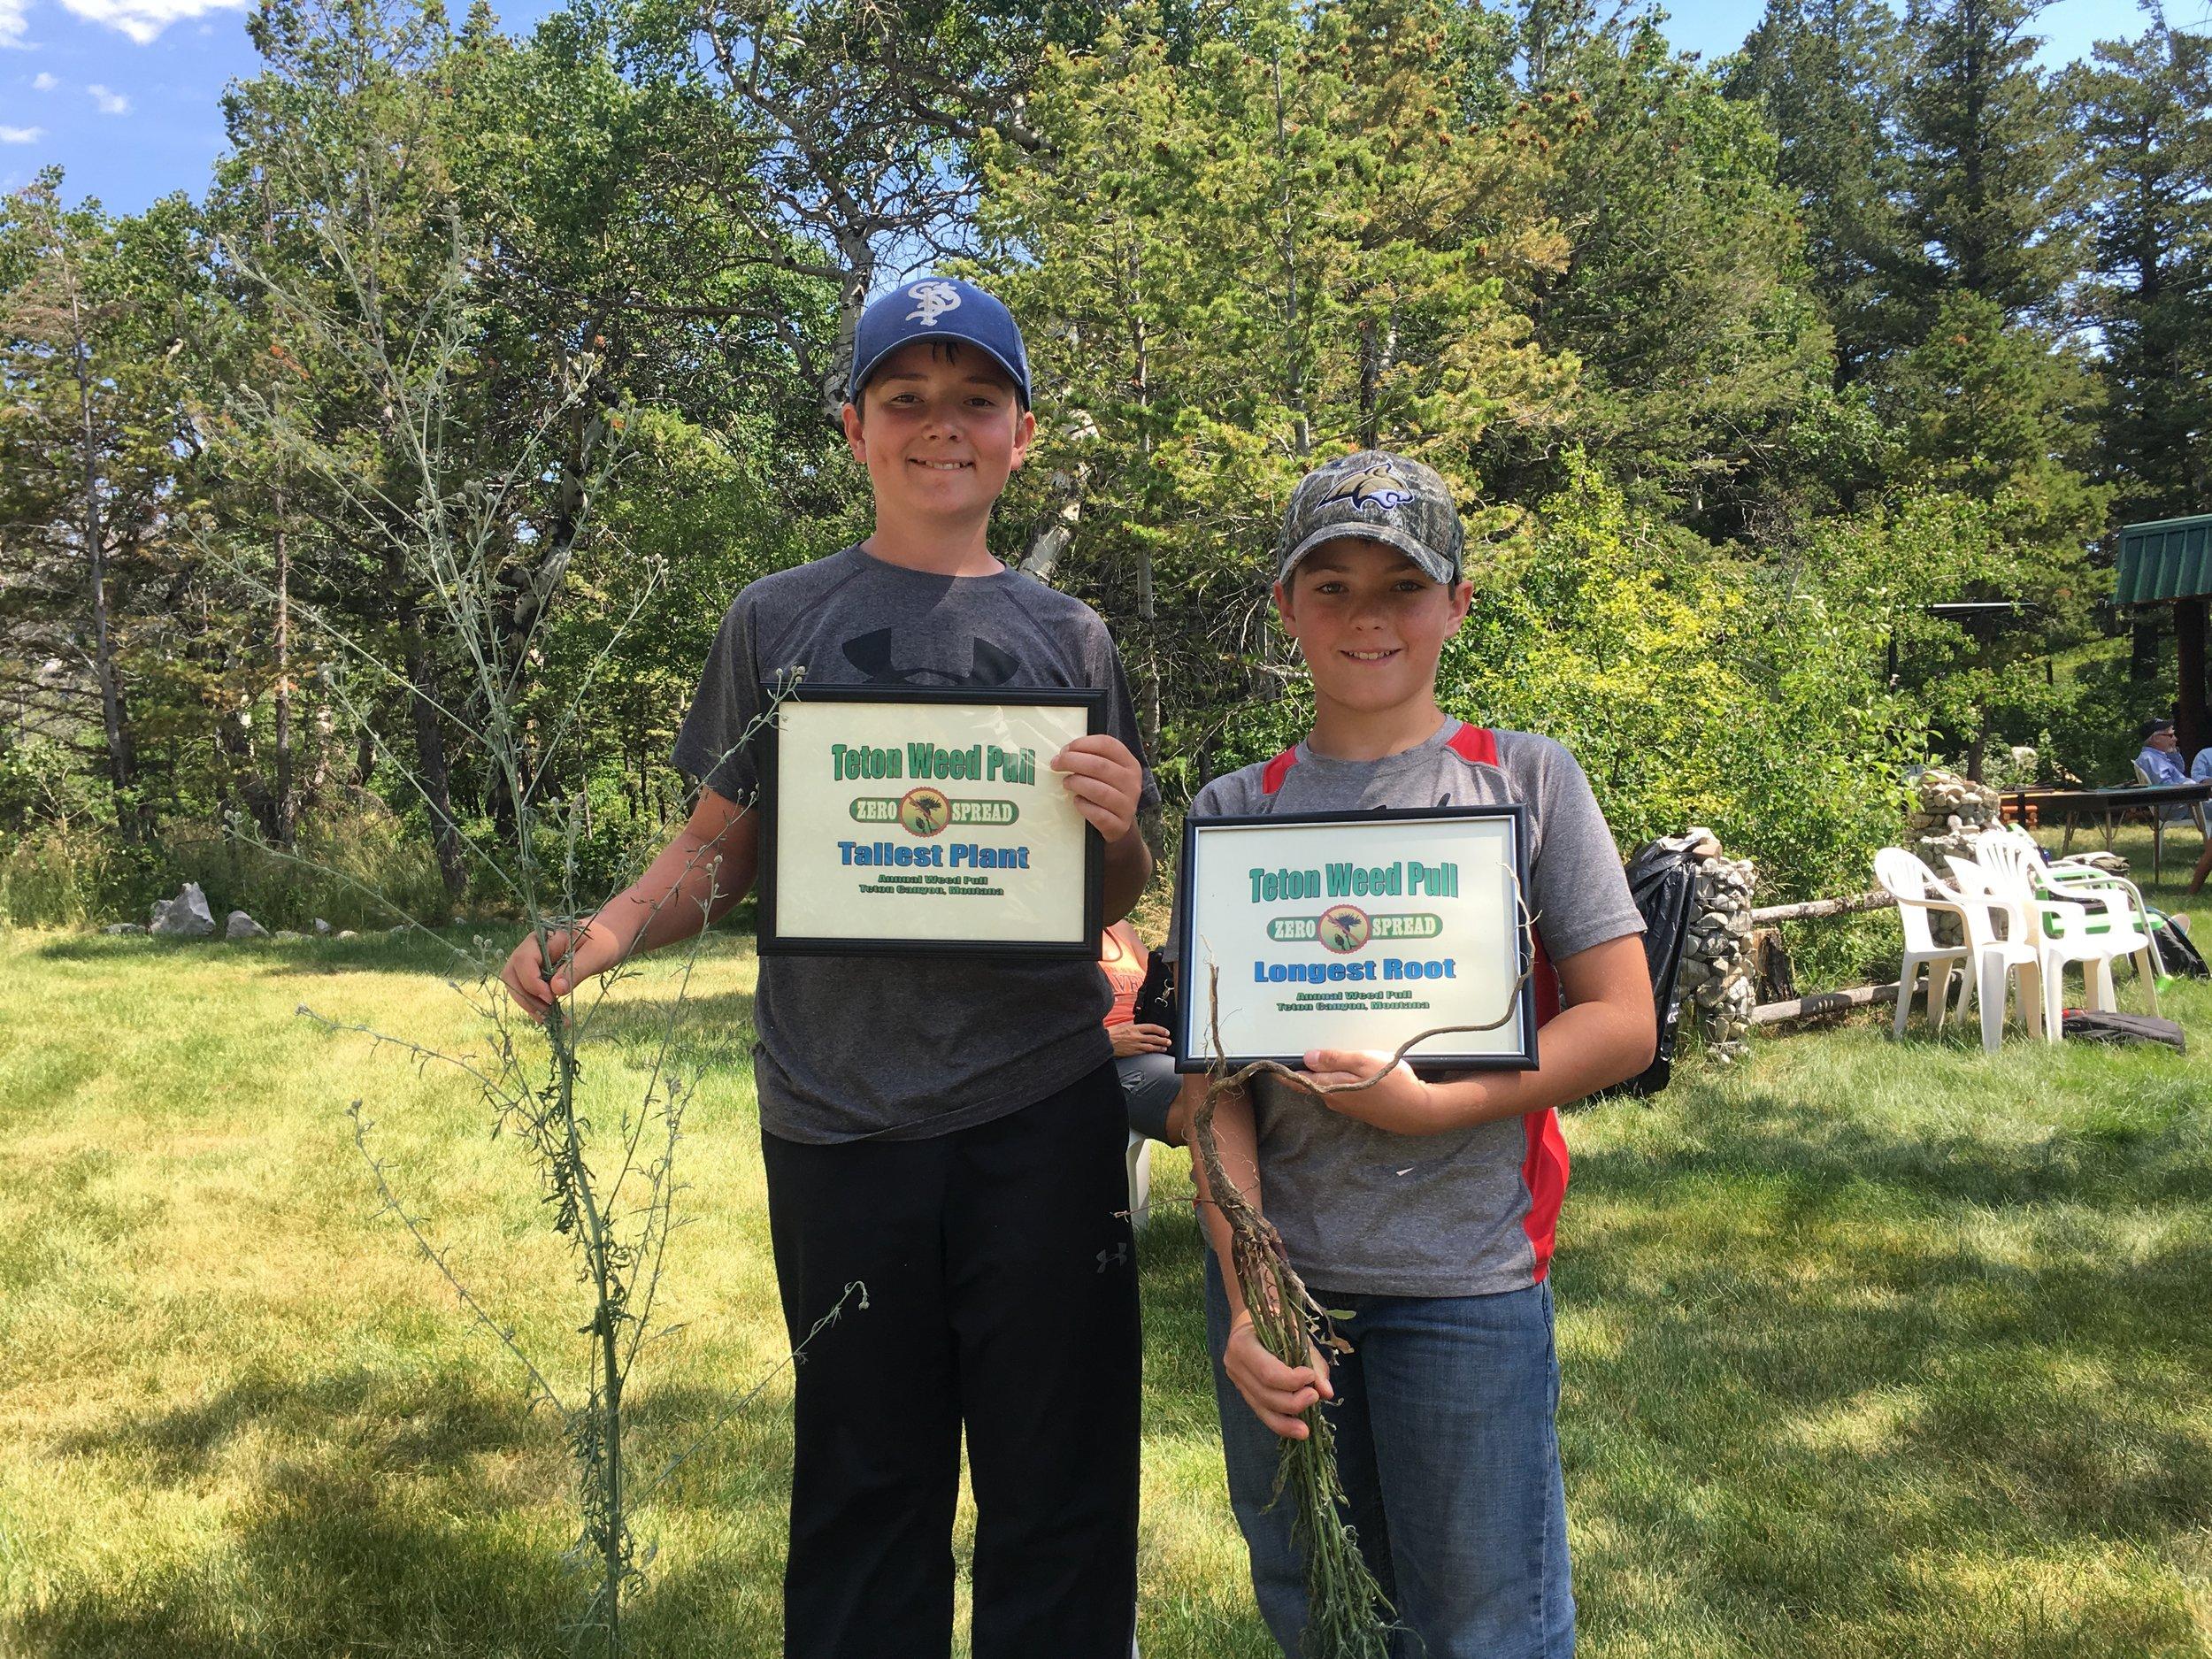 2017 Teton Weed Pull awards